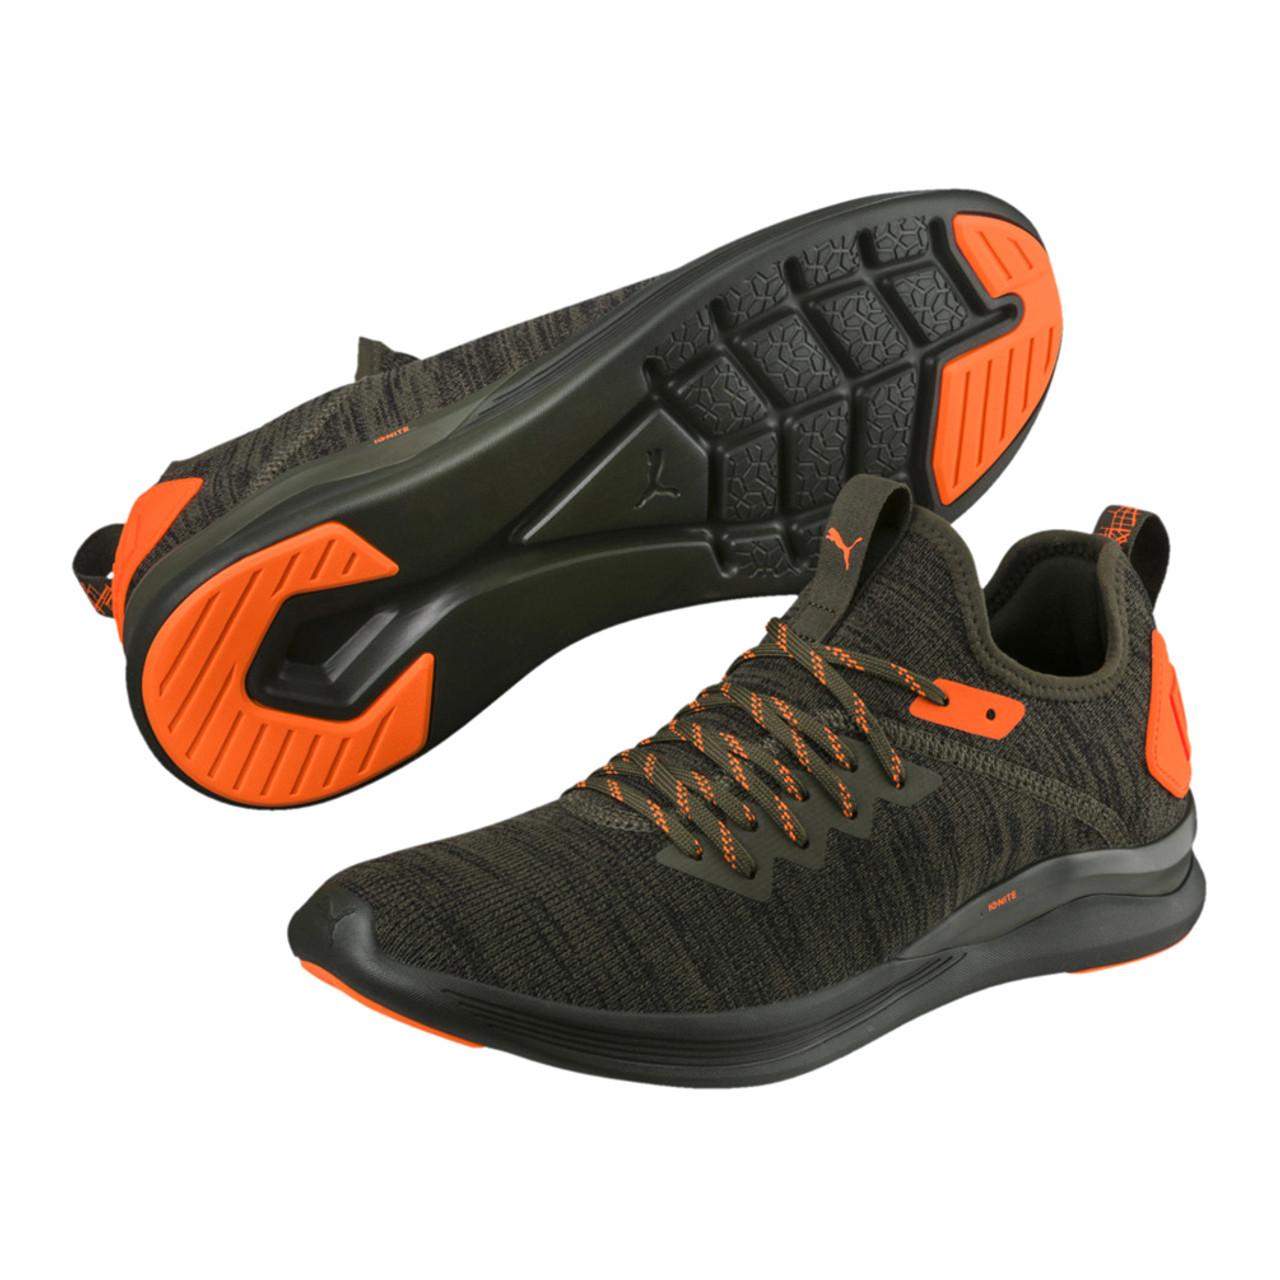 quality design bcee8 68195 Puma Men's Ignite Flash EvoKNIT Unrest Training Shoe Forest Green/Shocking  Orange